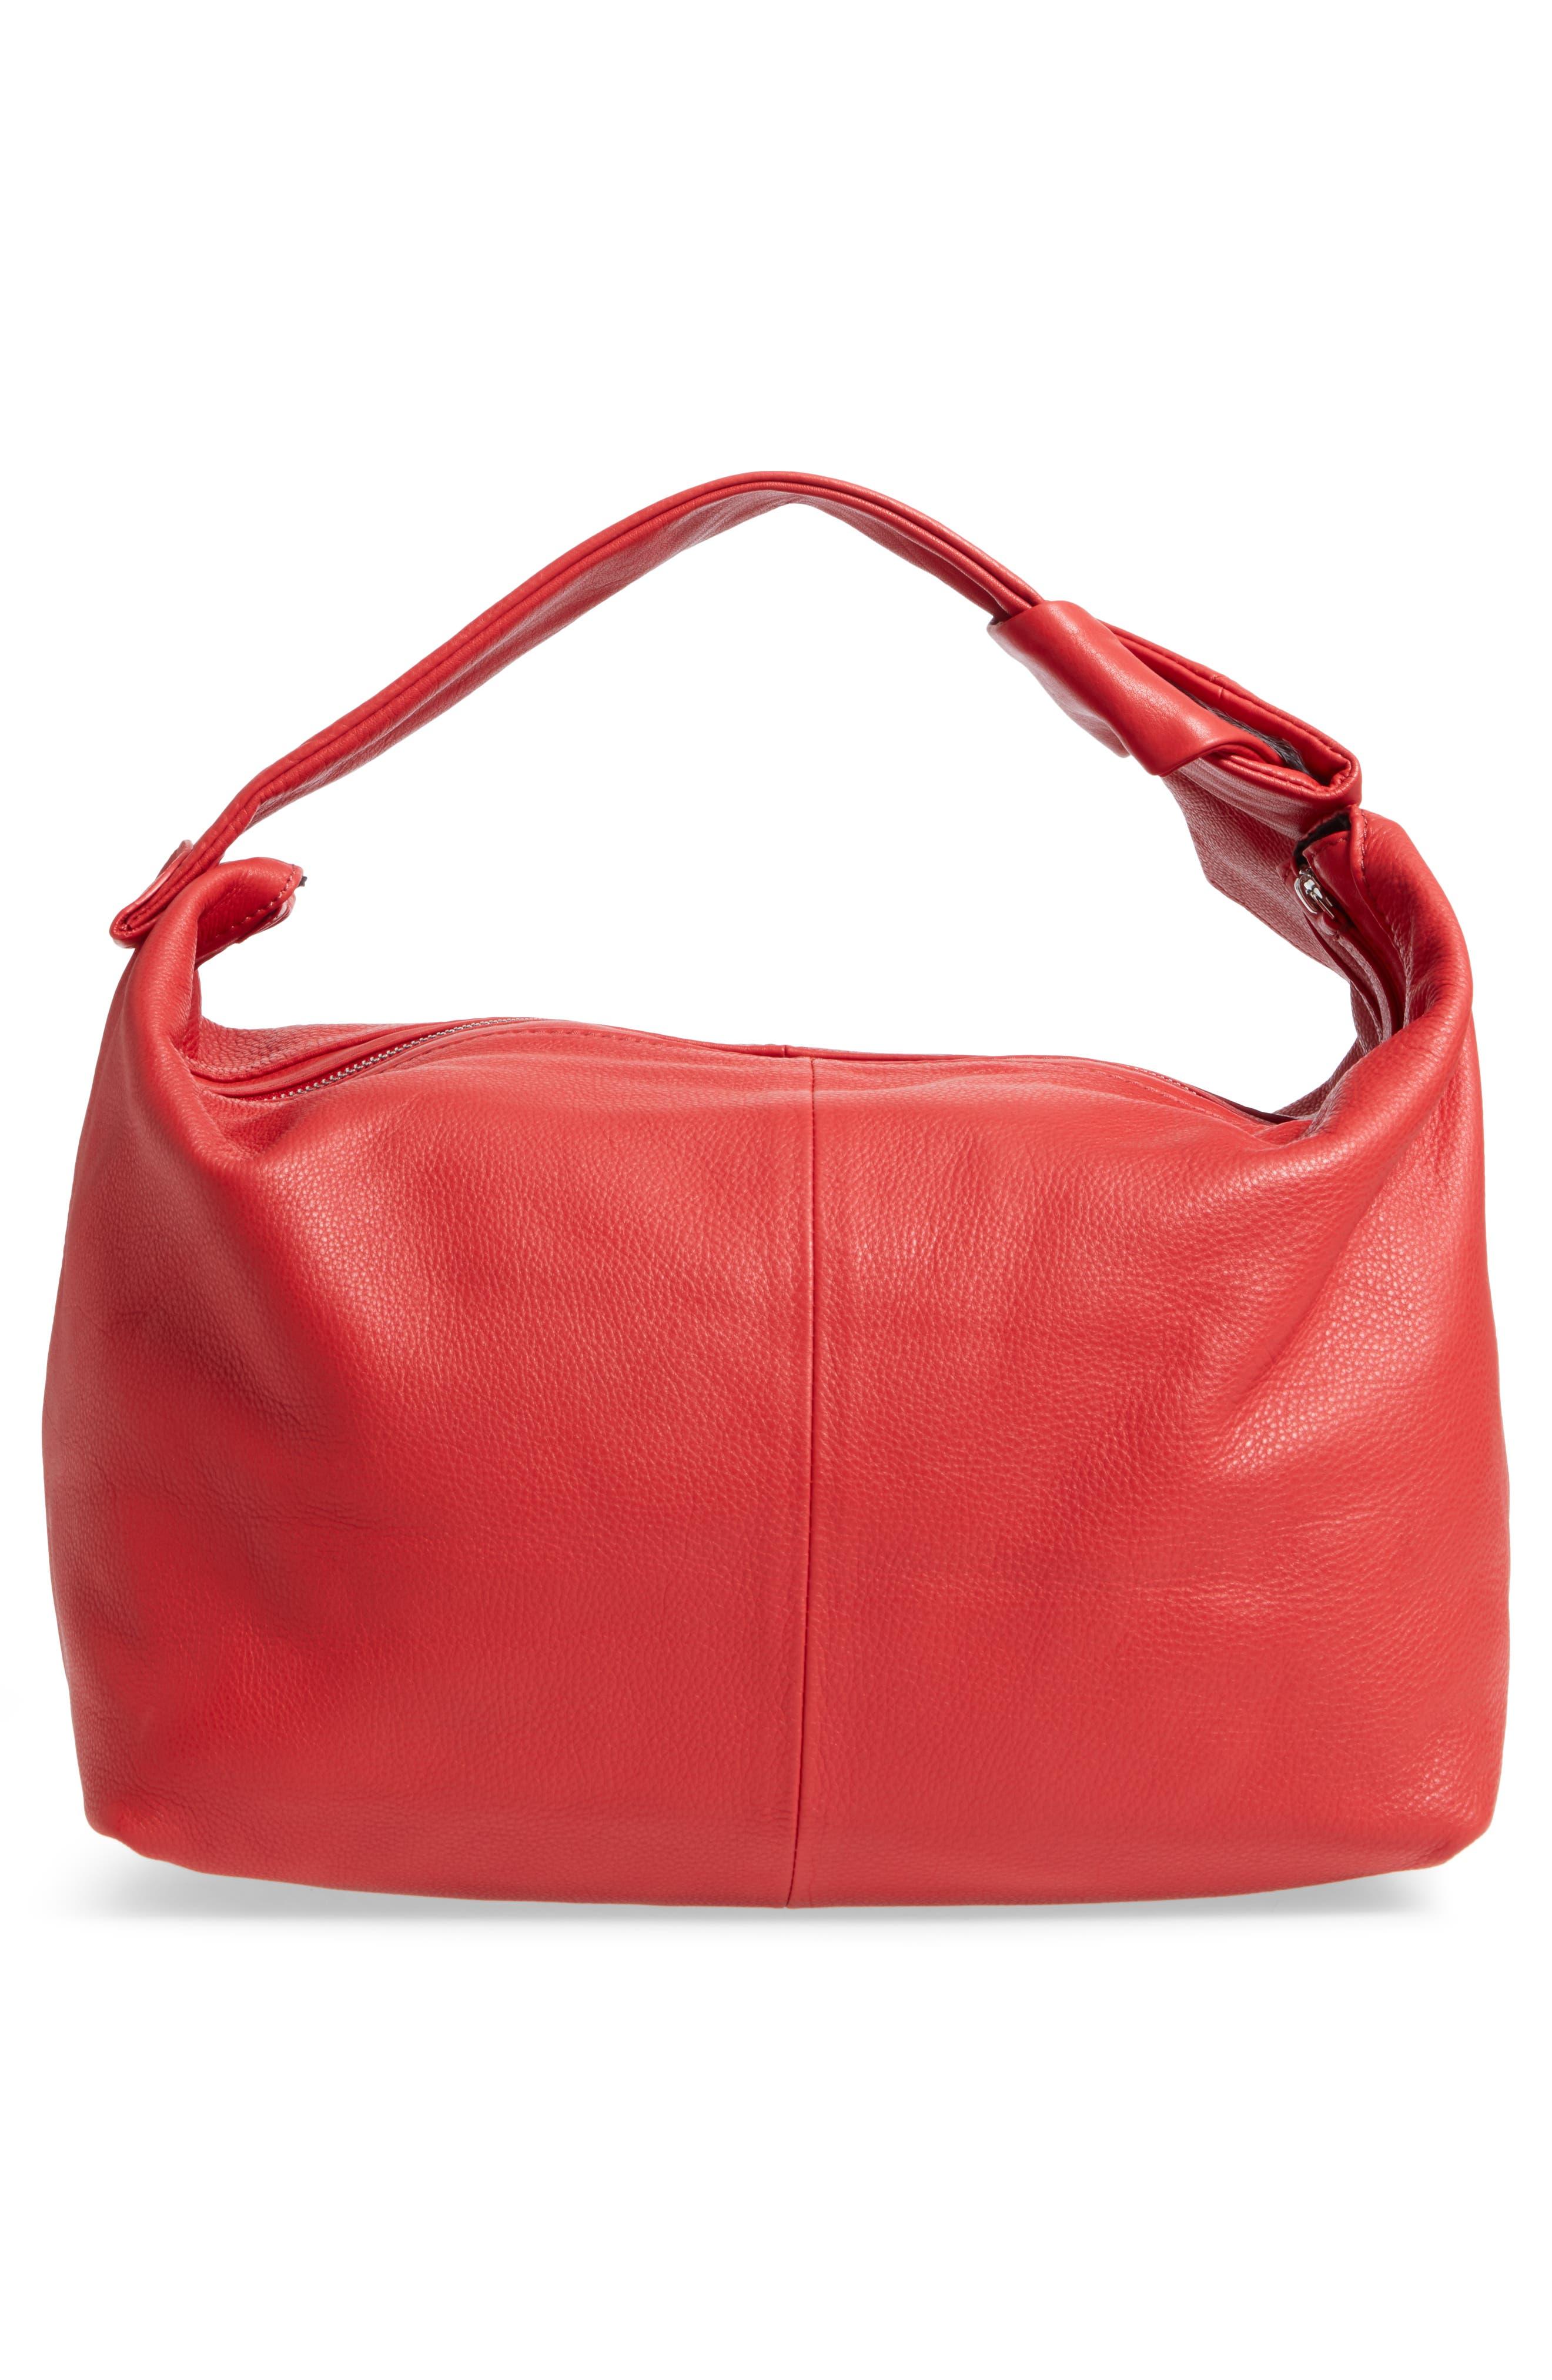 Premium Leather Jasmine Hobo Bag,                             Alternate thumbnail 3, color,                             Red